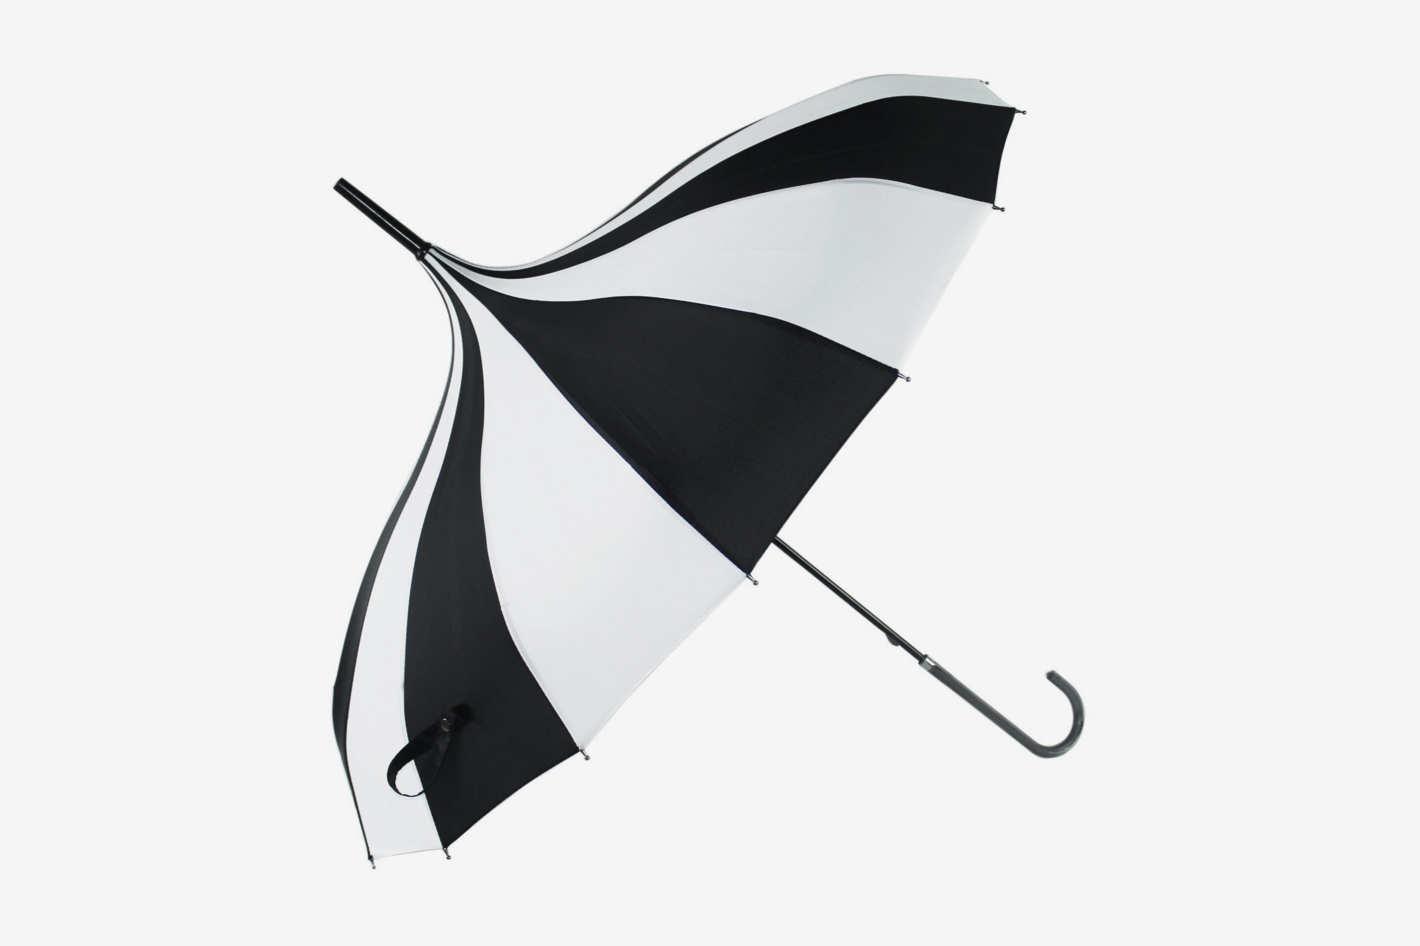 Kung Fu Smith Parasol